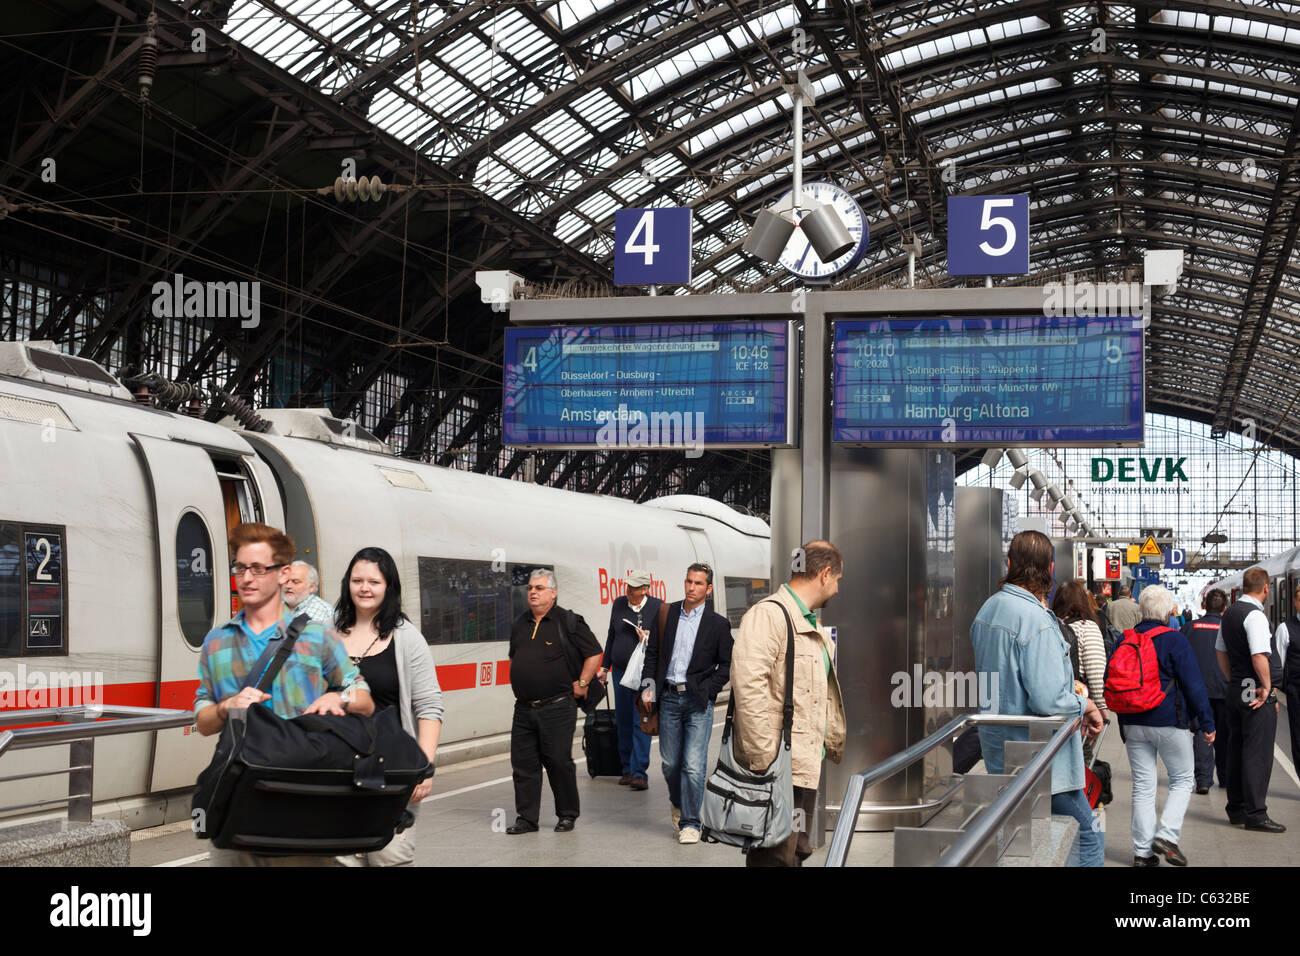 Train travelers on a station platform at the Frankfurt Hauptbahnhof, Germany. - Stock Image